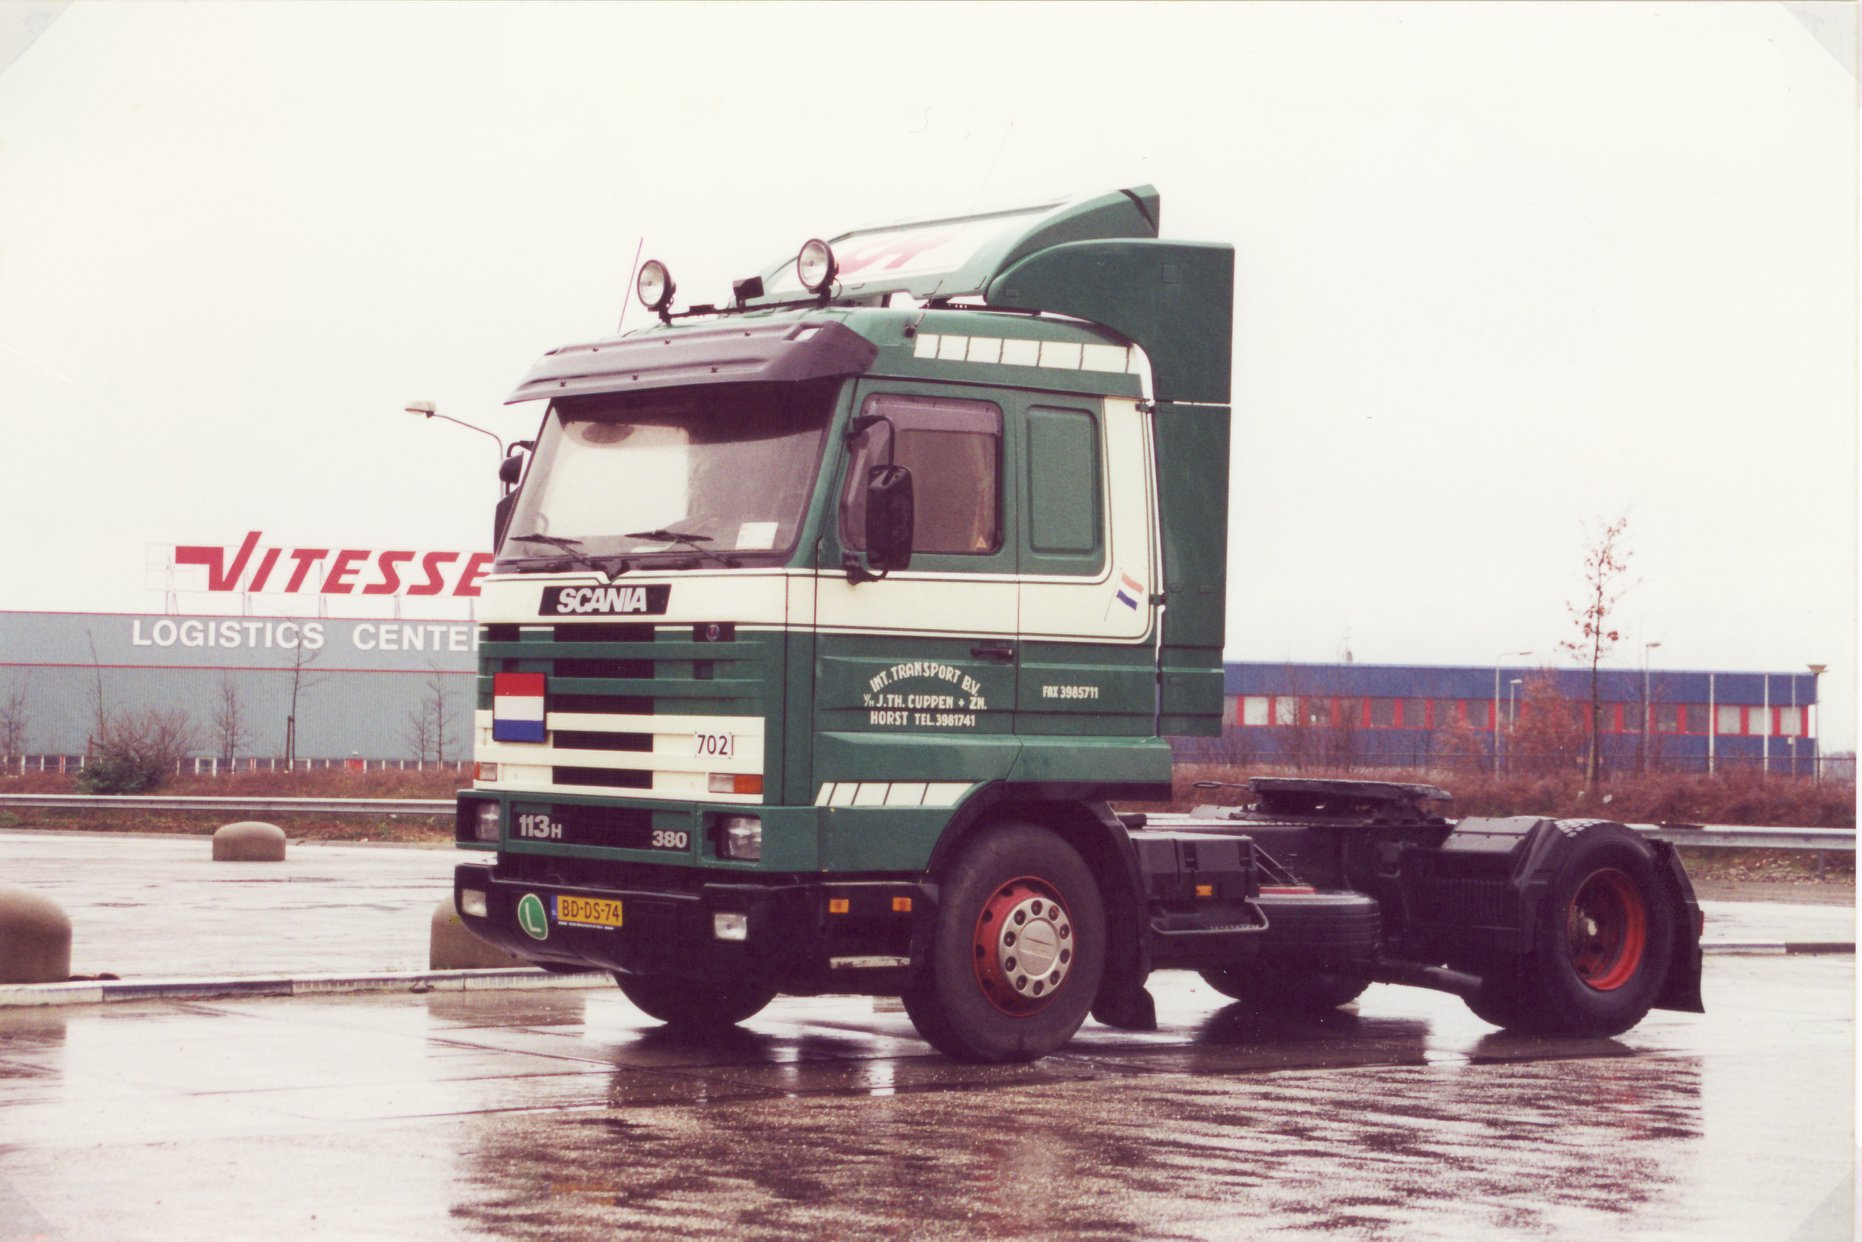 Scania-113h-380-Math-Keijsers-foto